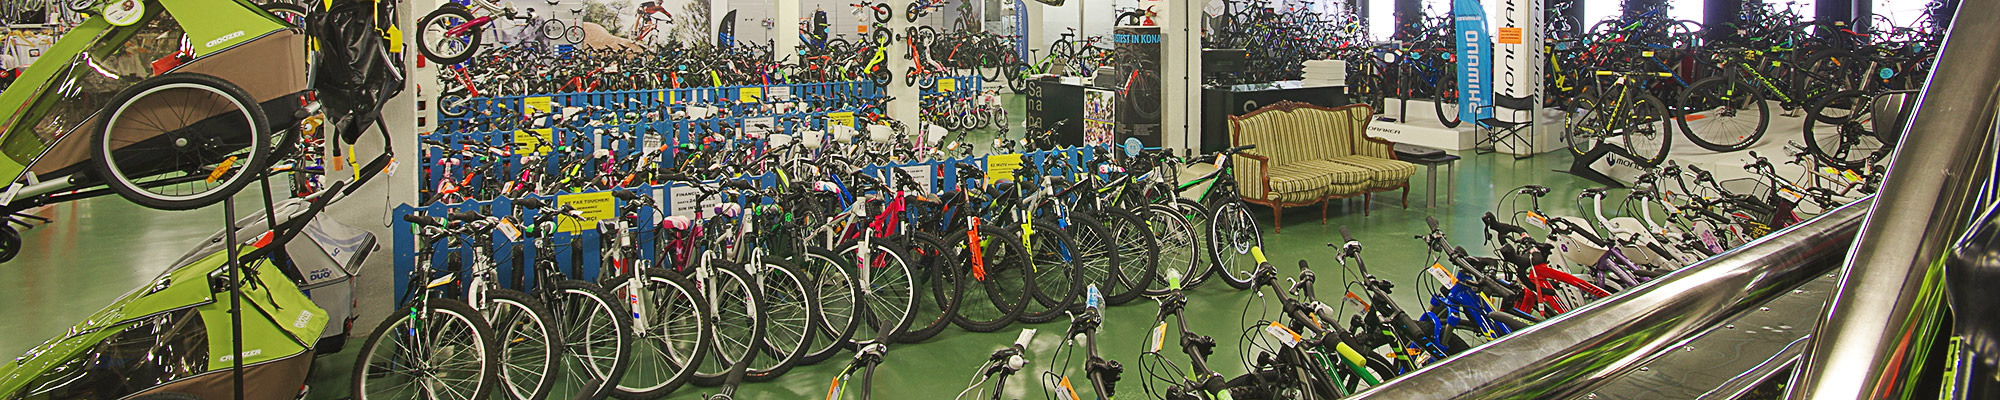 Ofertas bicicletas Oiartzun Bike